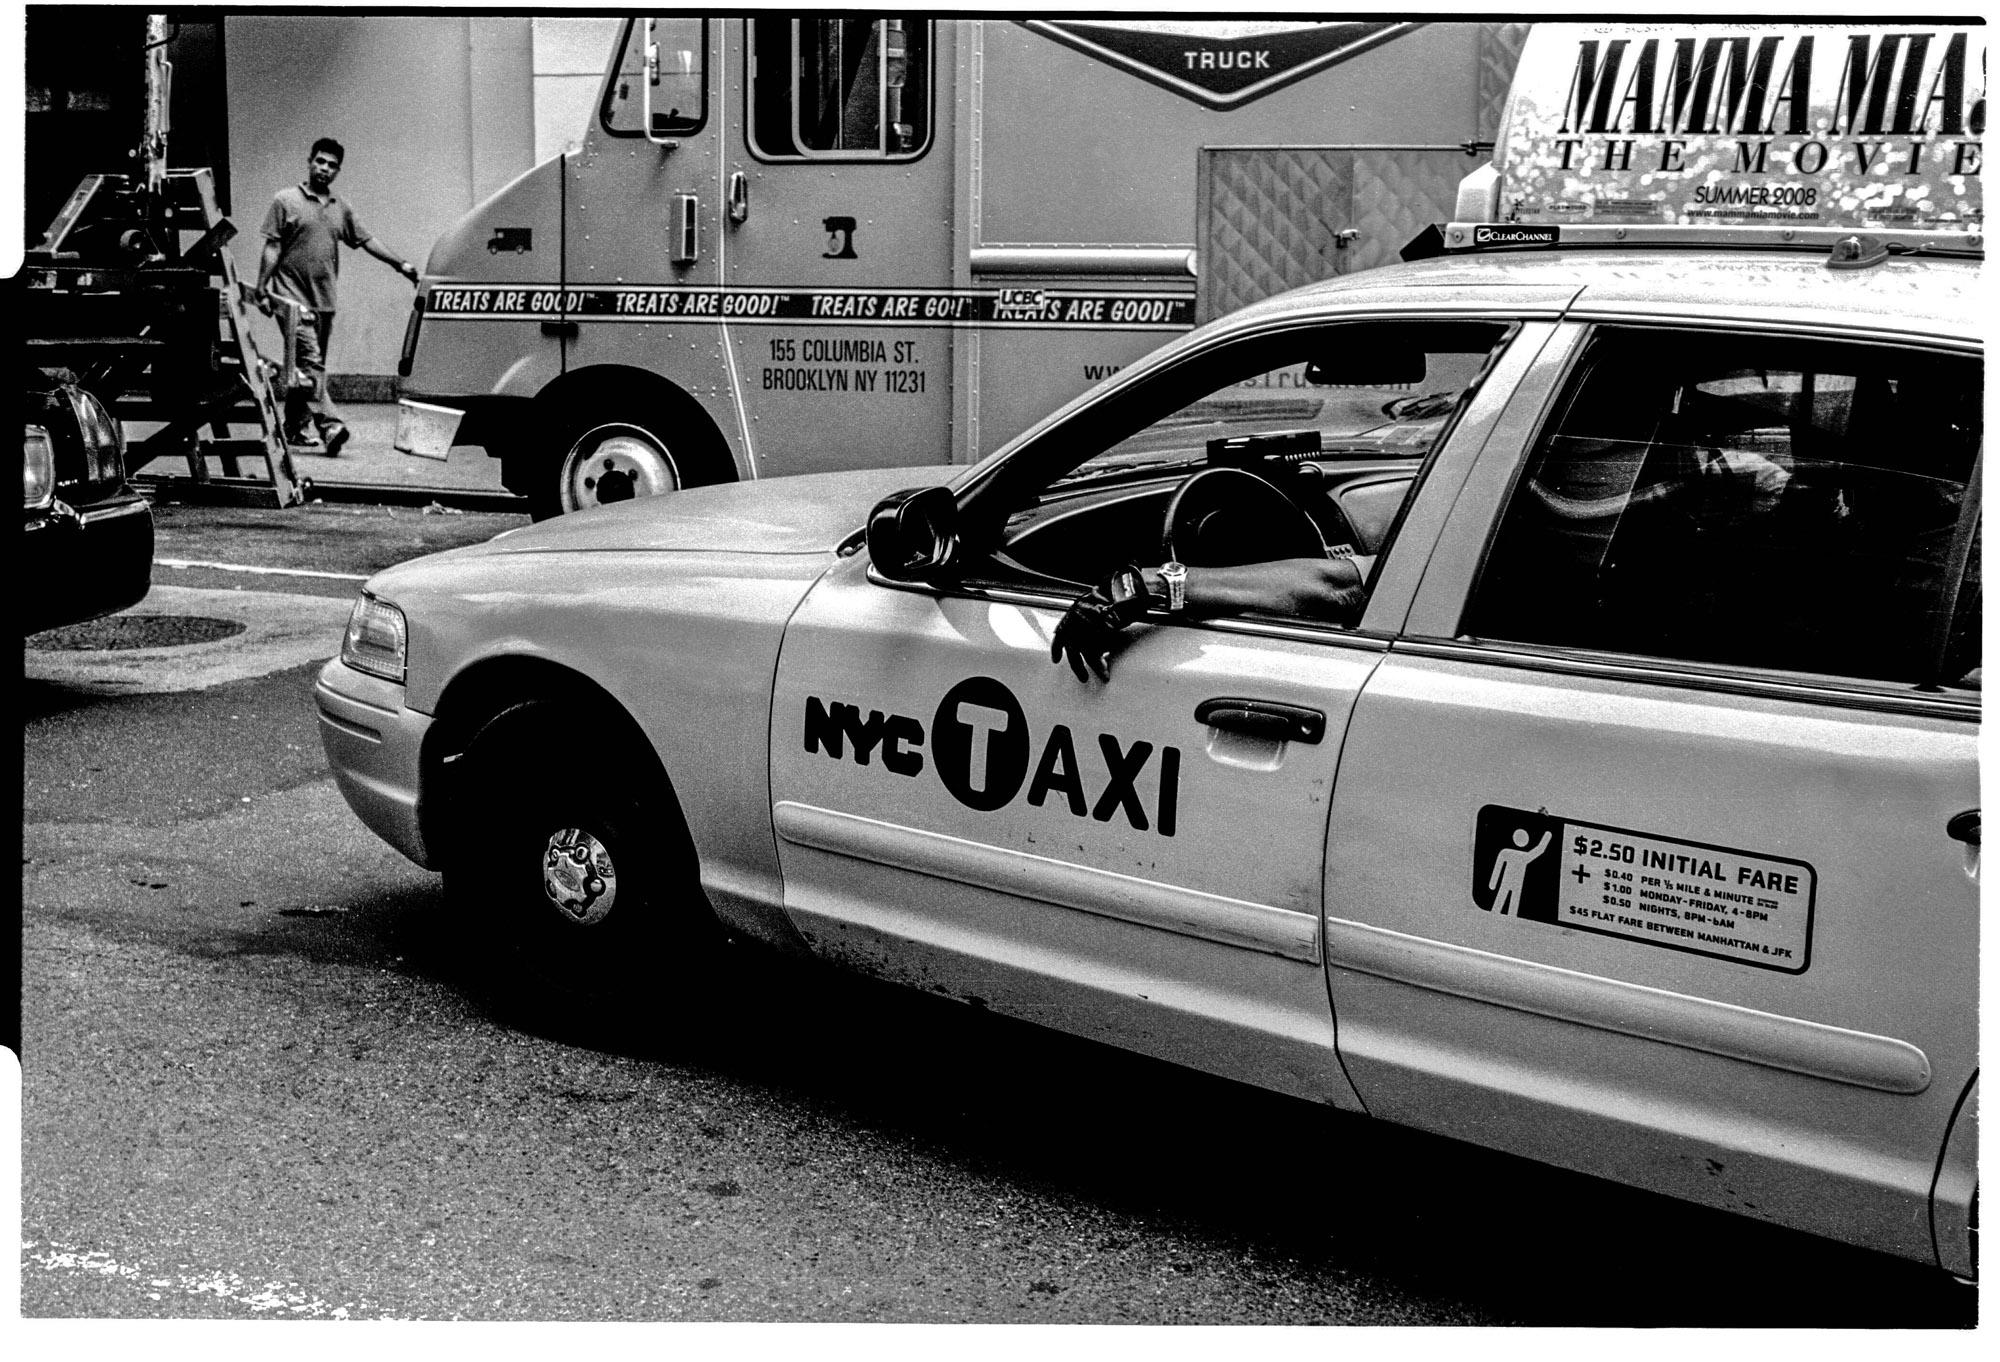 NEW-YORK-1999-2009_001.jpg